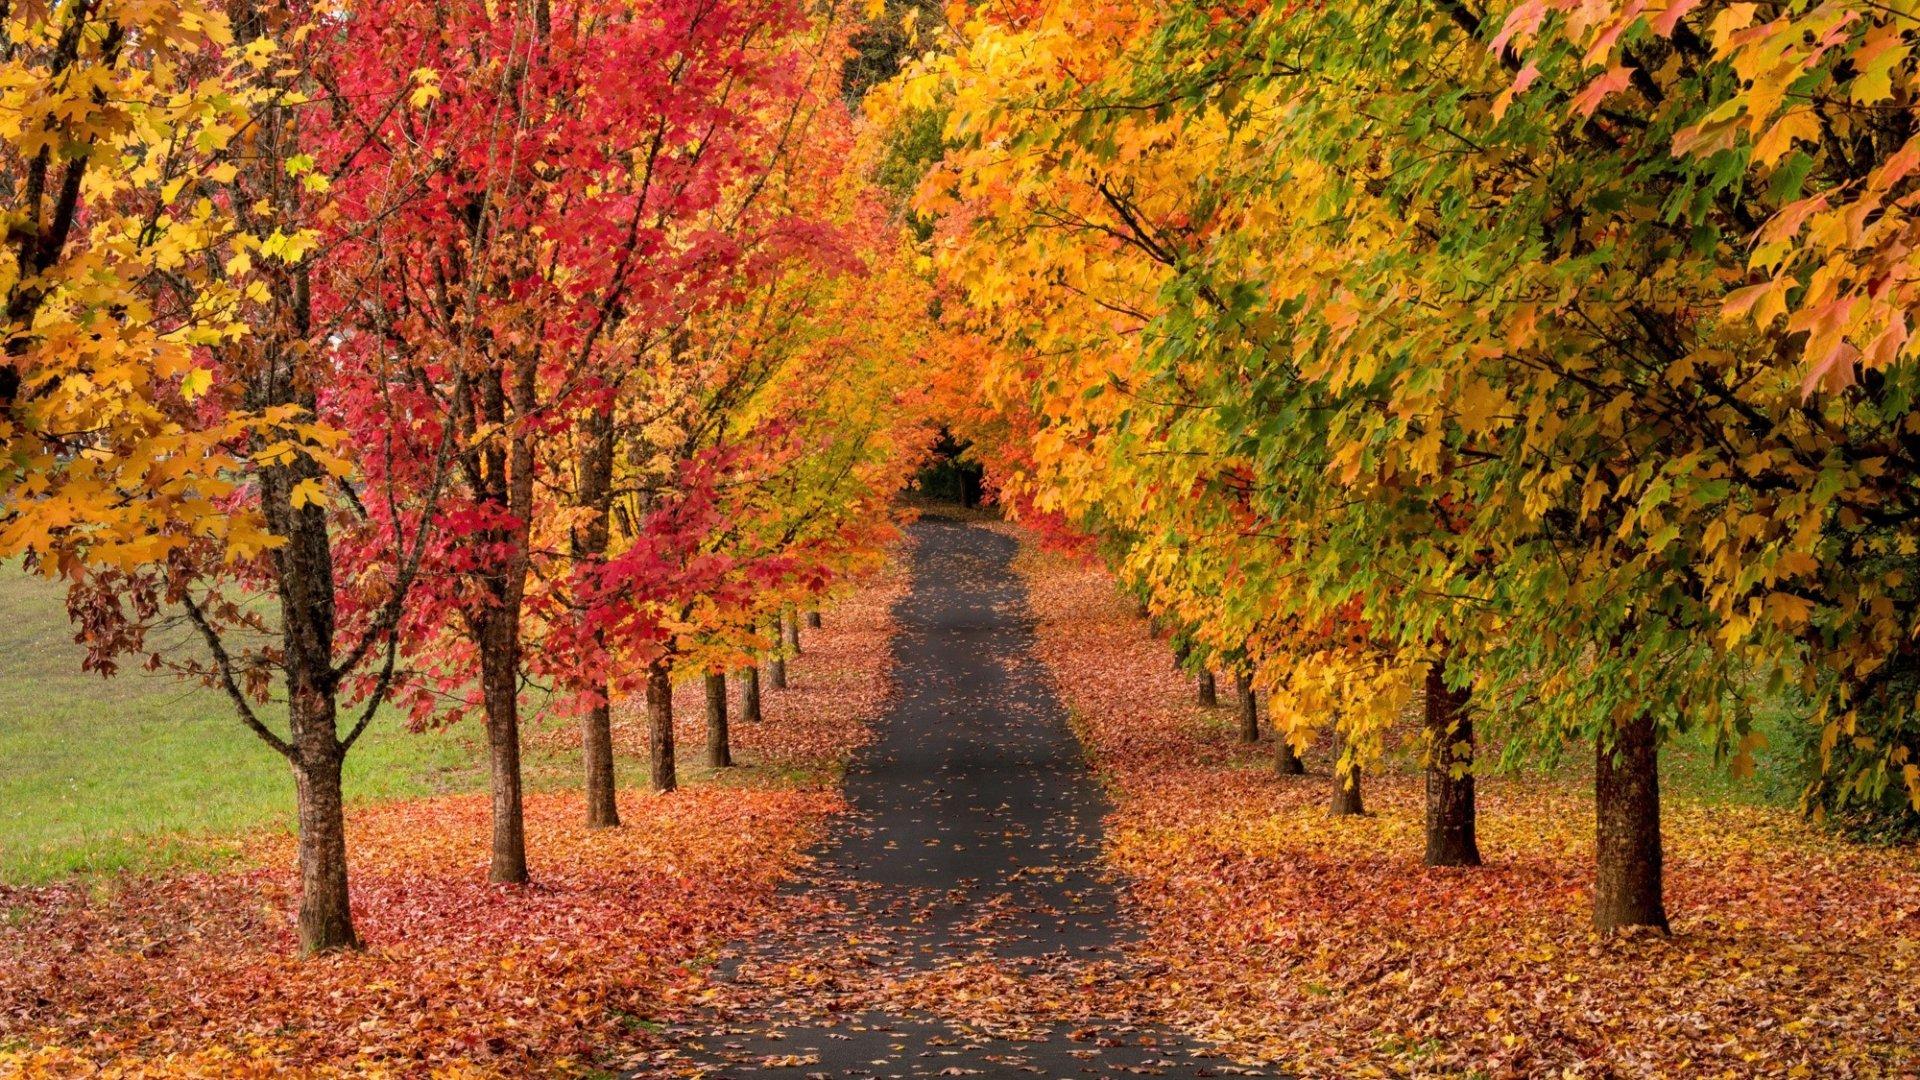 Fall Farm Desktop Wallpaper Tree Lined Autumn Road Hd Wallpaper Background Image